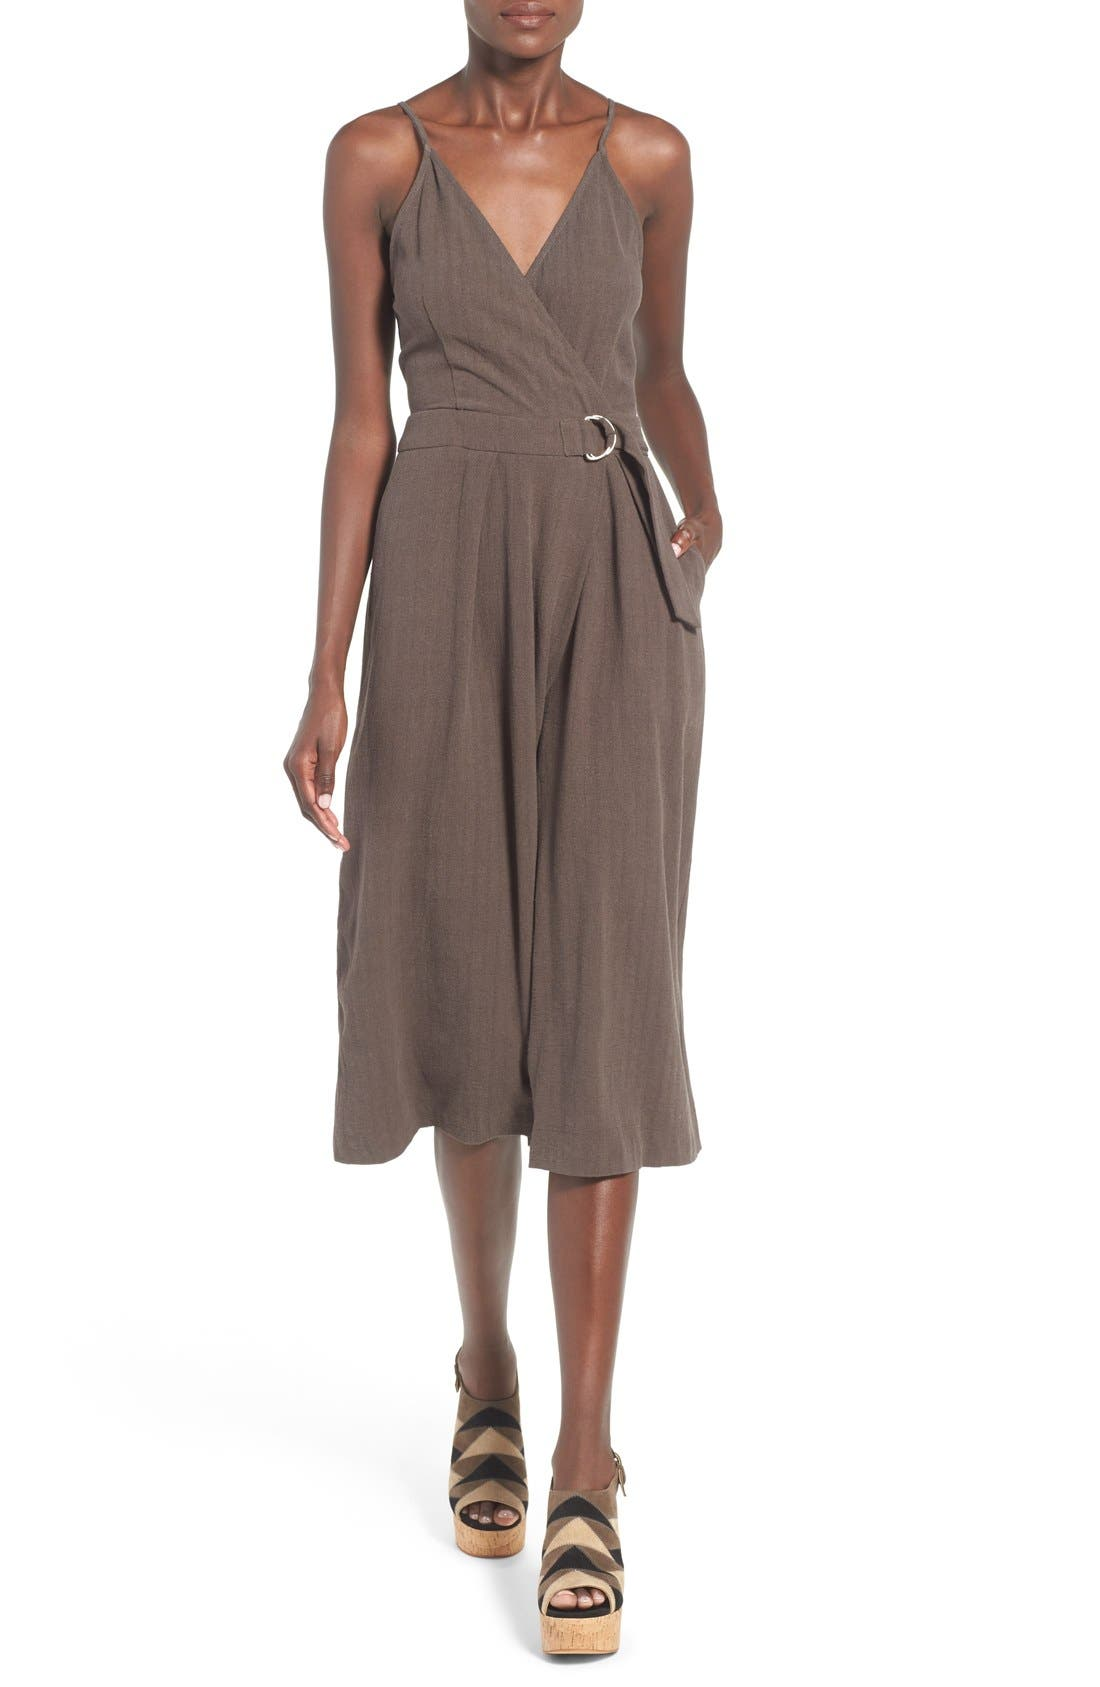 Main Image - ASTR 'Peonia' Cotton & Linen Surplice Jumpsuit